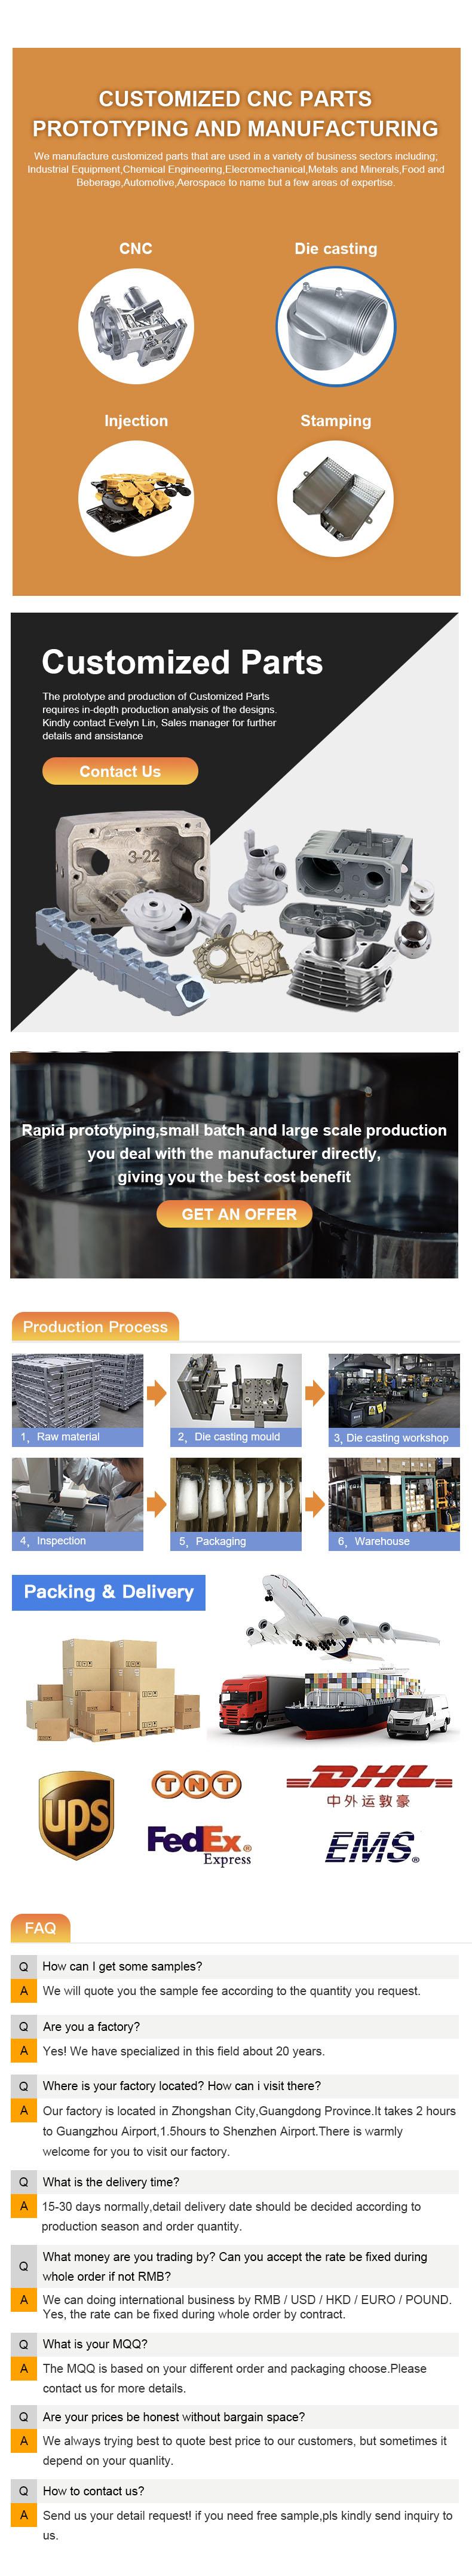 aluminium die casting process,CNC MACHINING PARTS,PRECISION CNC MACHINING PARTS,CNC ALUMINUM PARTS,Machined Products,CNC Machined Products,BoYang Hardware Products